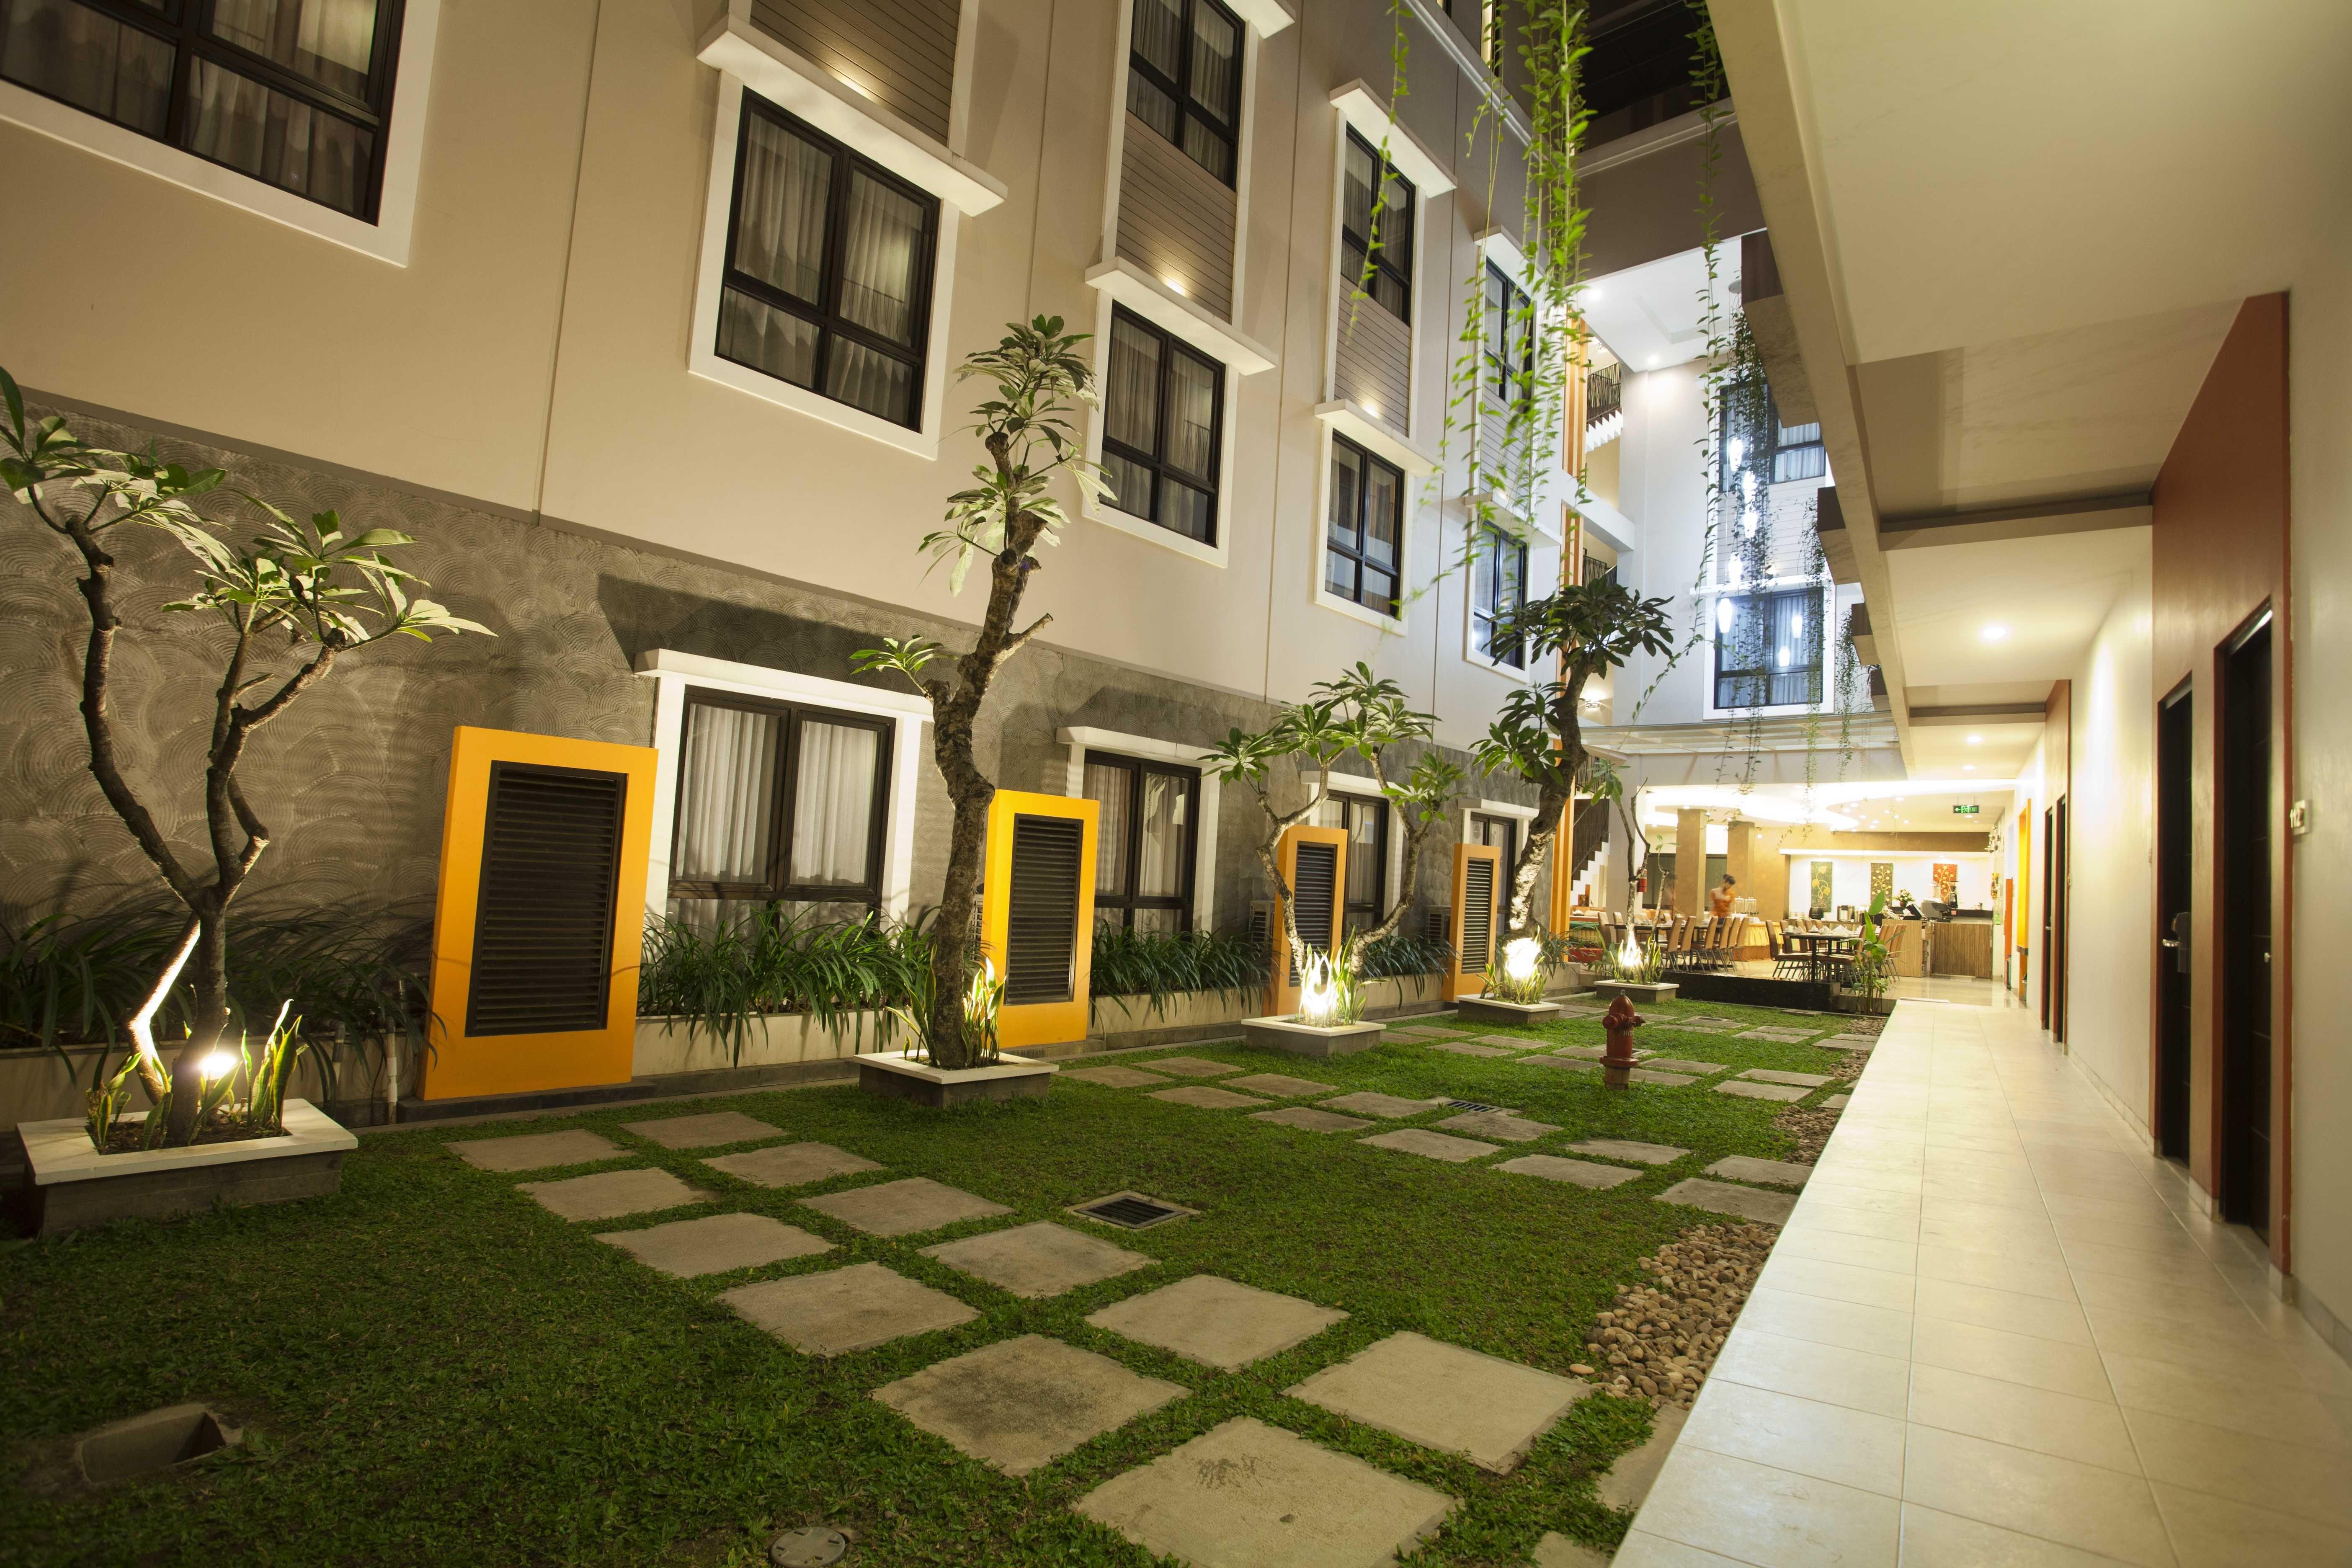 Hotel Jentra Malioboro,Taman Budaya Yogyakarta